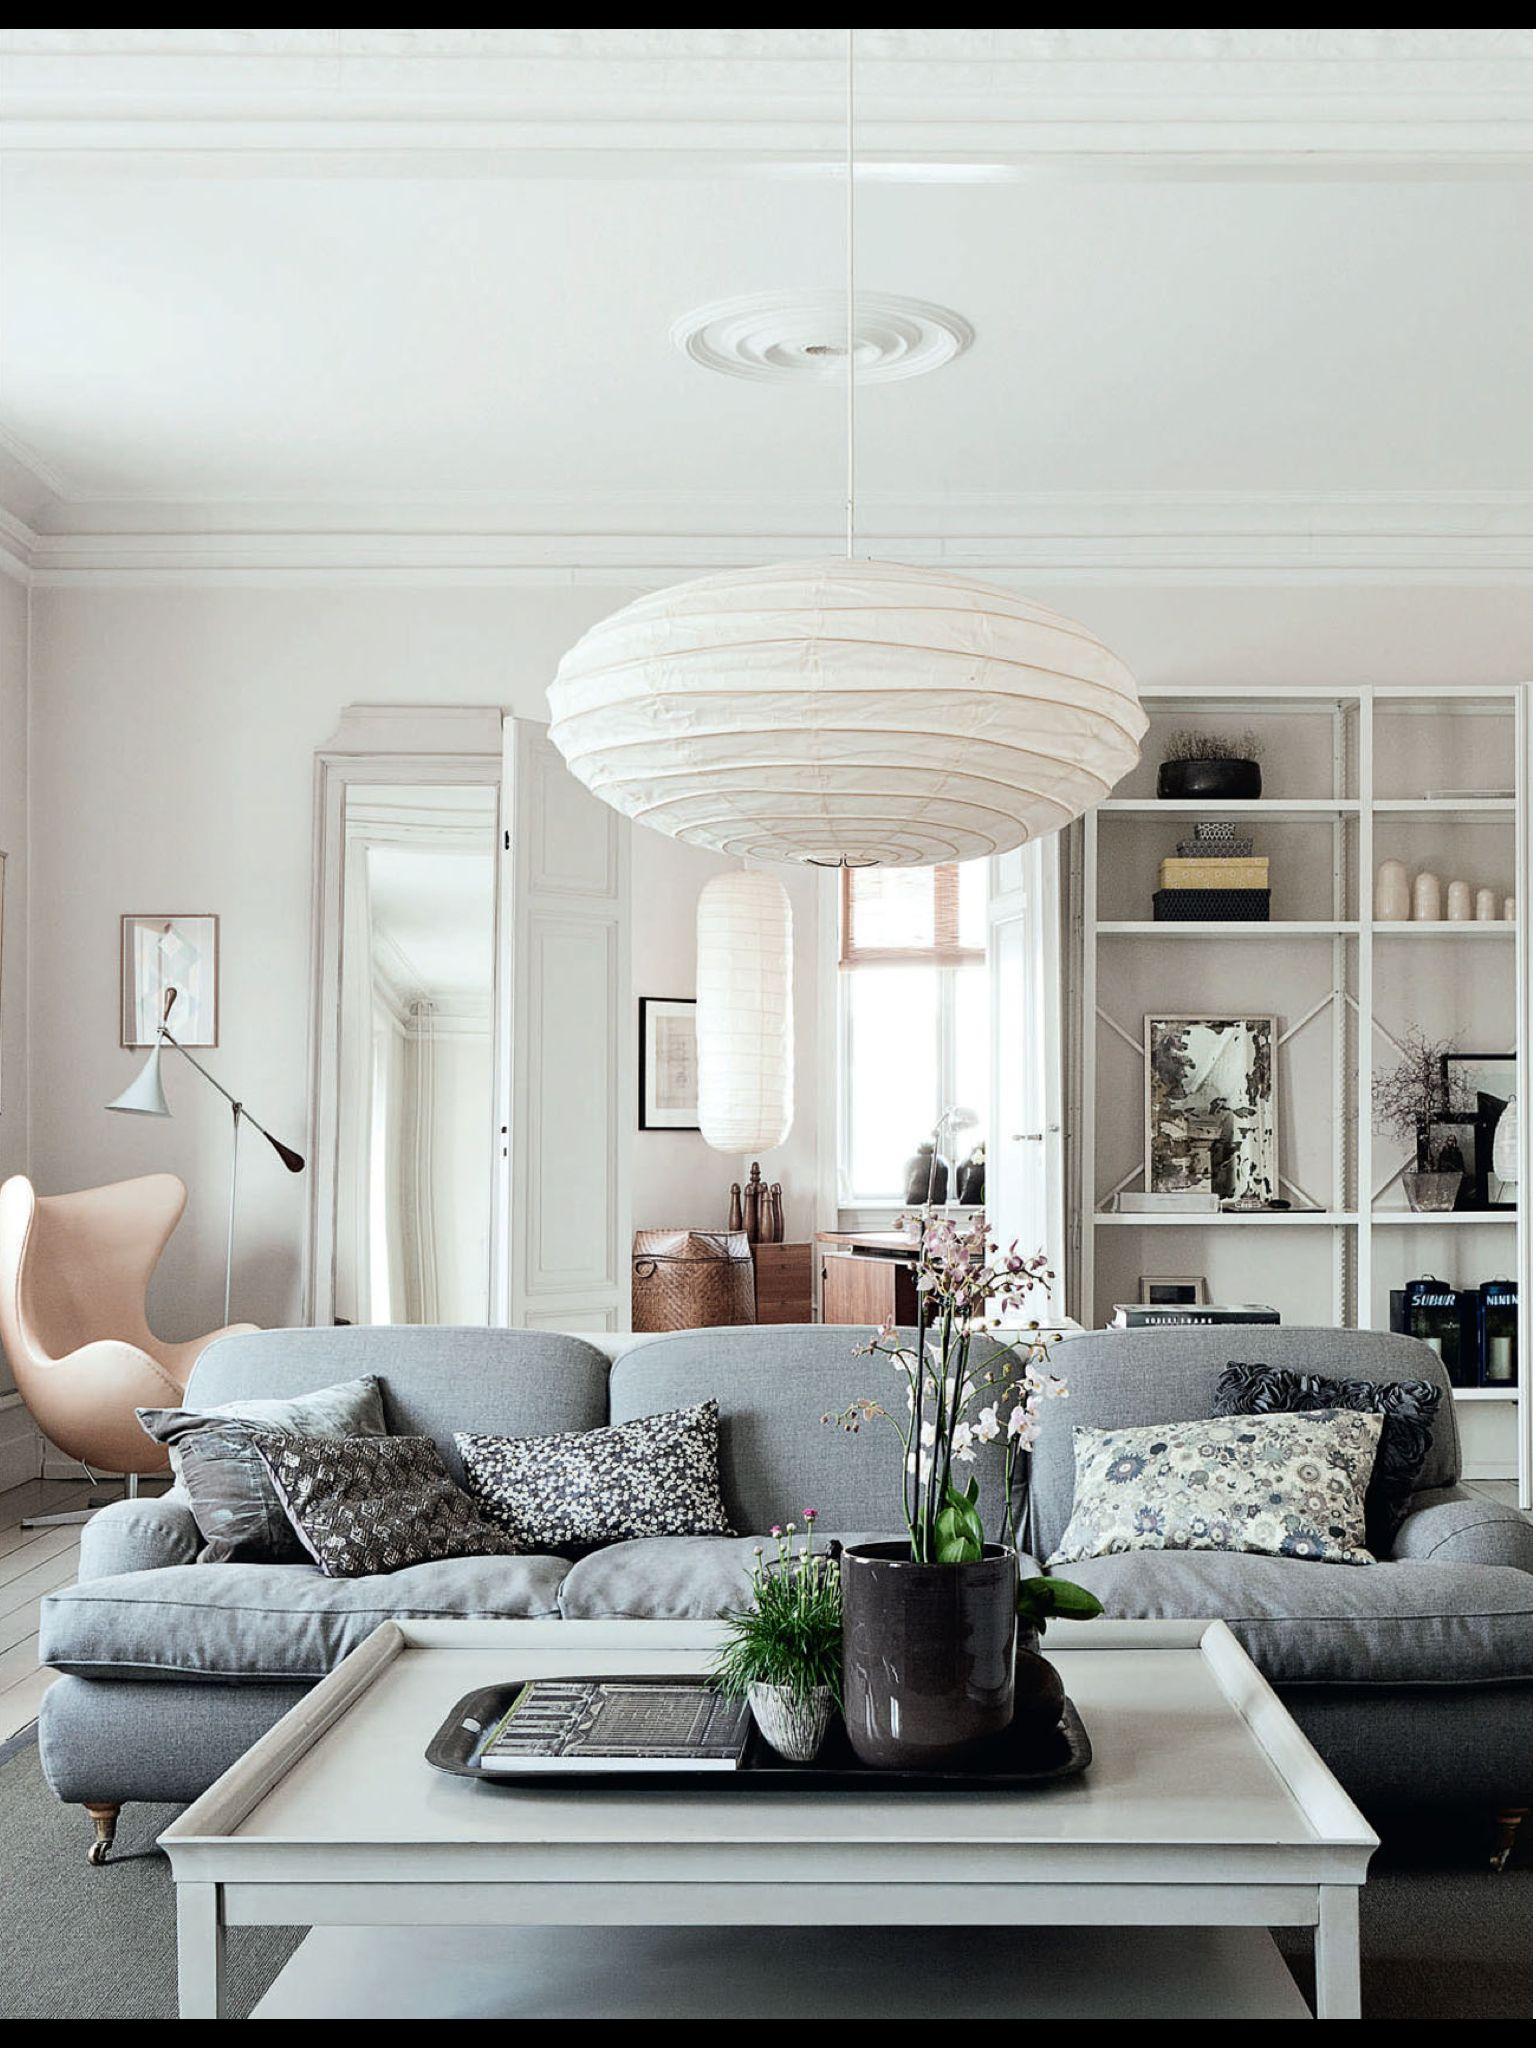 Lovely warm colour combination   Home Decor that I love   Pinterest ...